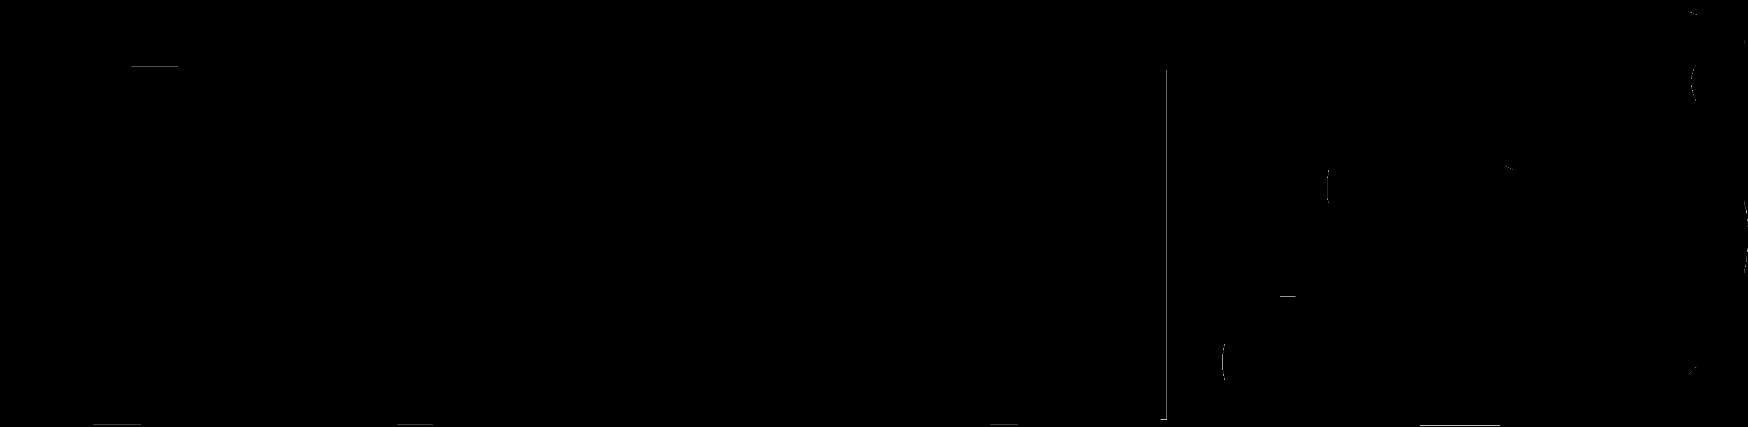 https://uploads-ssl.webflow.com/54723f1c79be4eb47403f478/58b0241f165efac83b24d5f9_Sortd-Squirrel-Logo-Full-Black.png